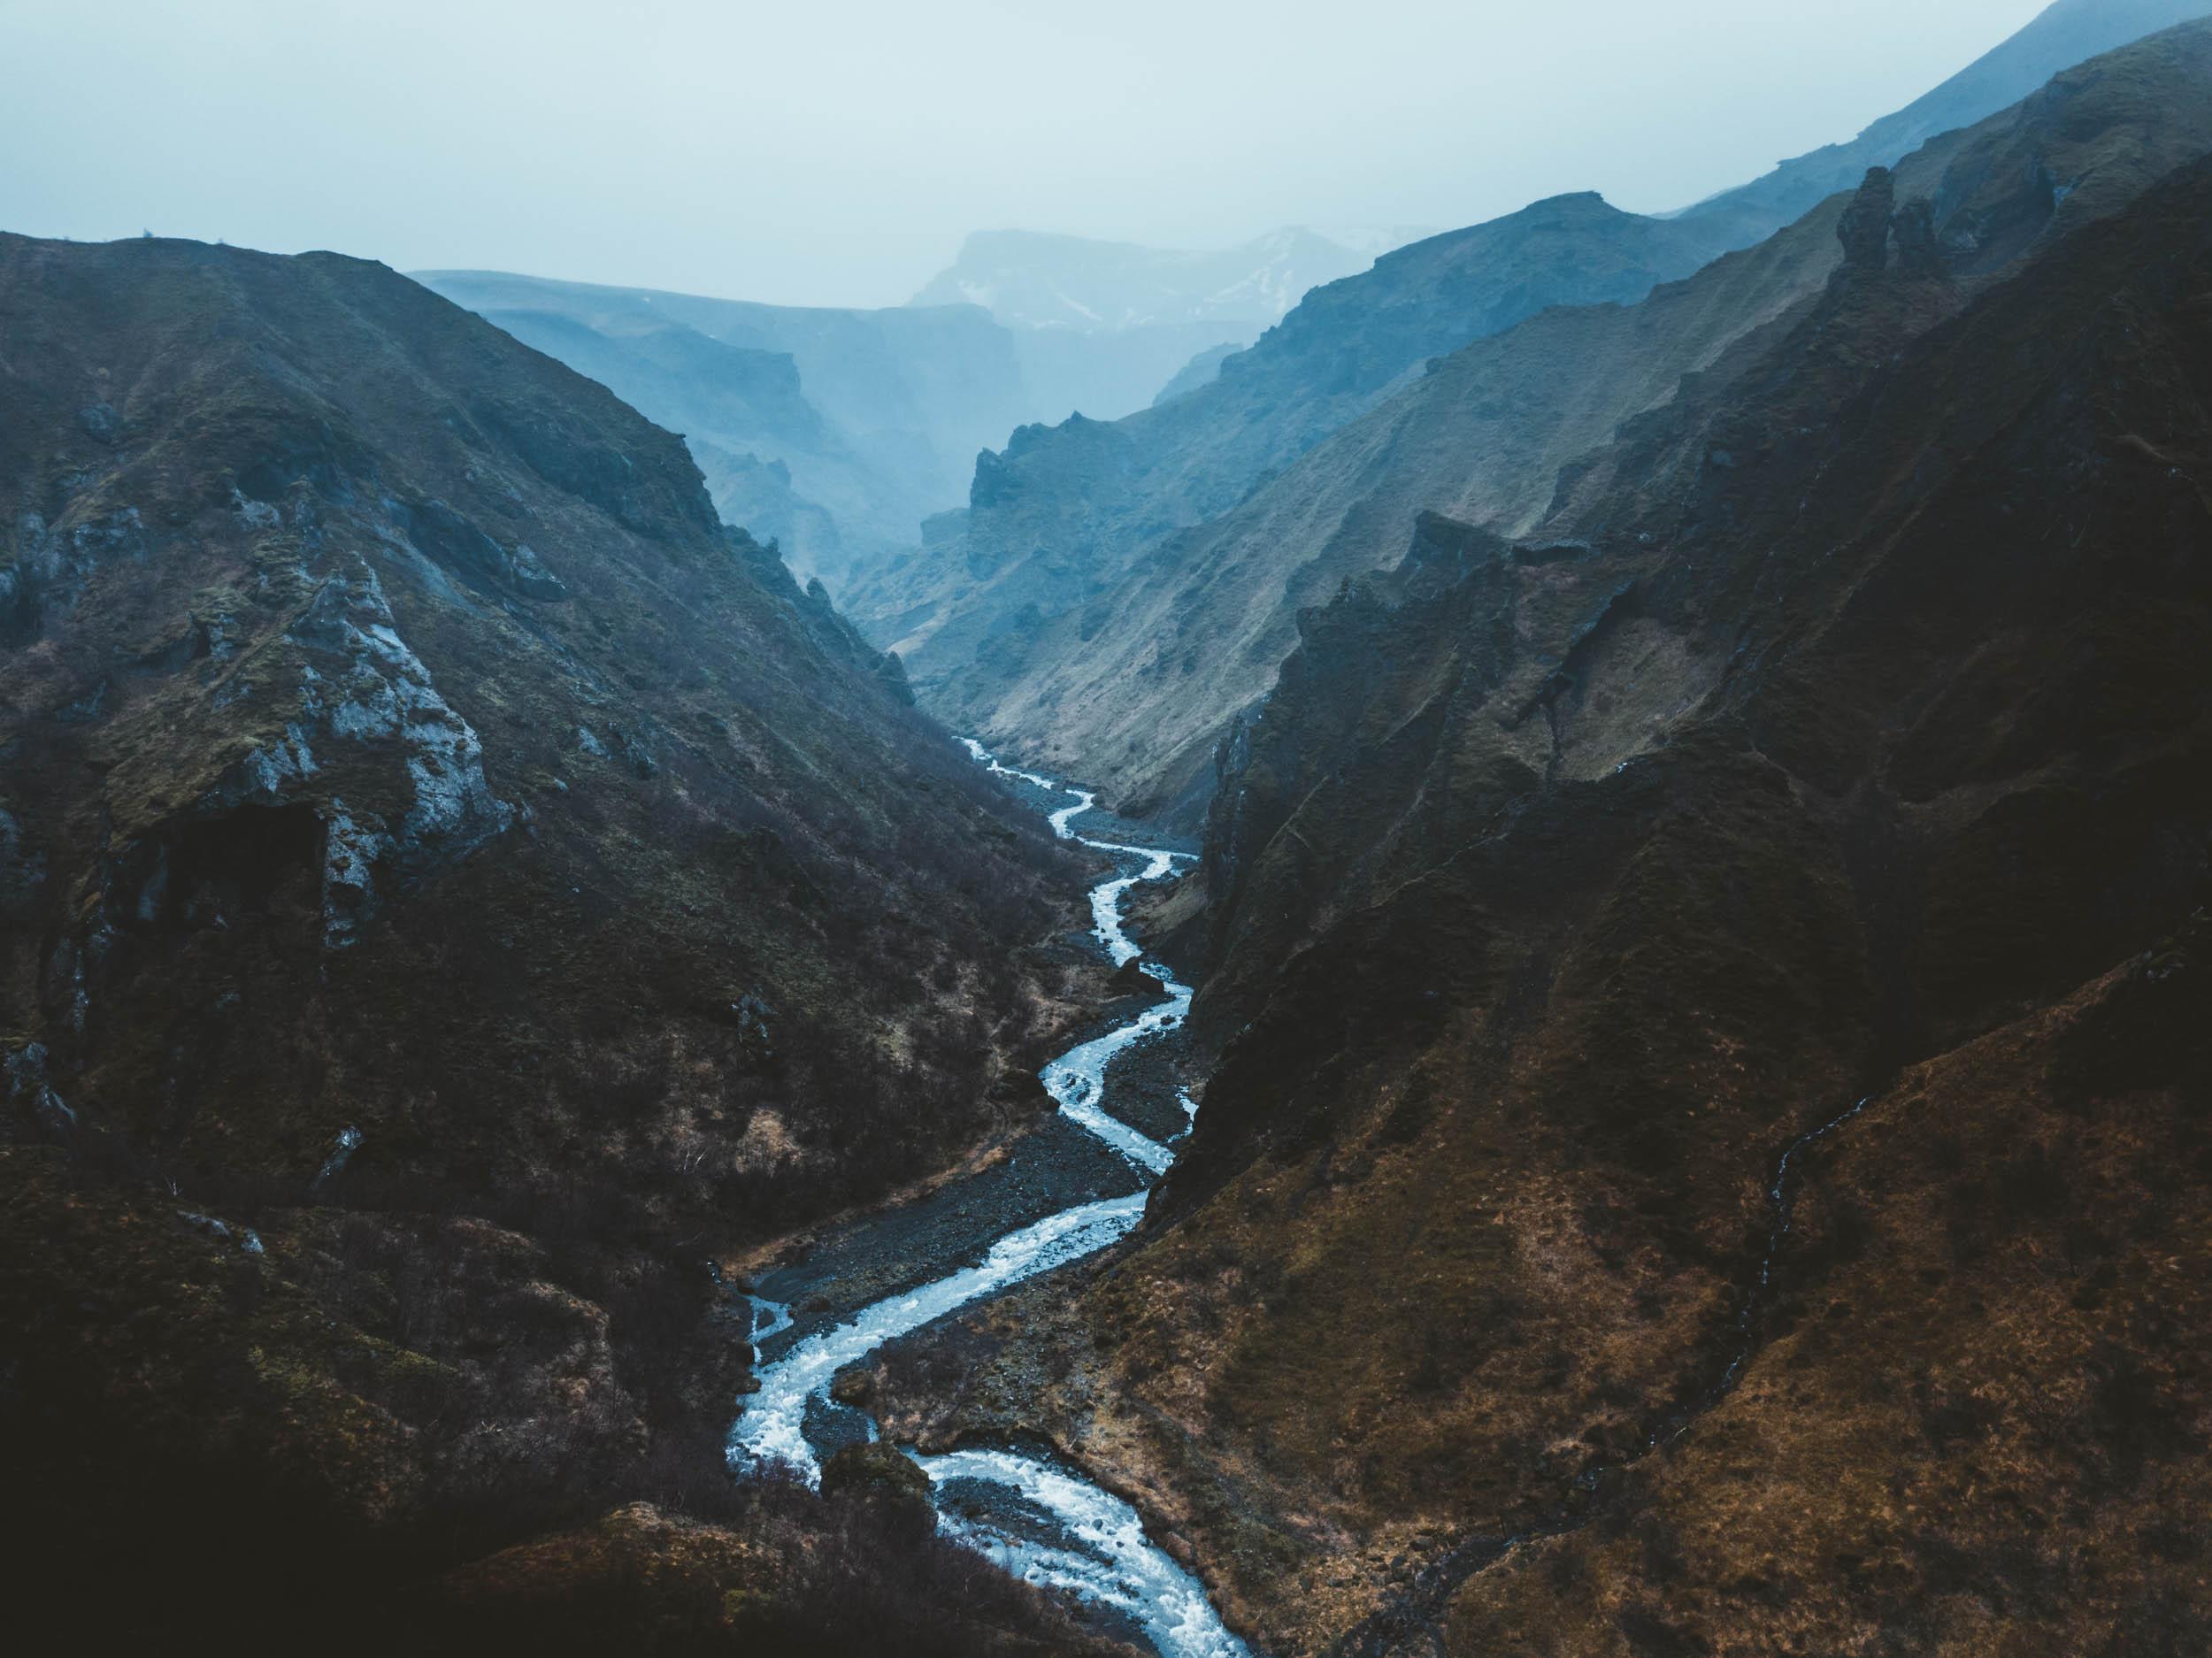 Iceland_Jan_2019_ByTomKahler_Lowres (50 of 262).jpg